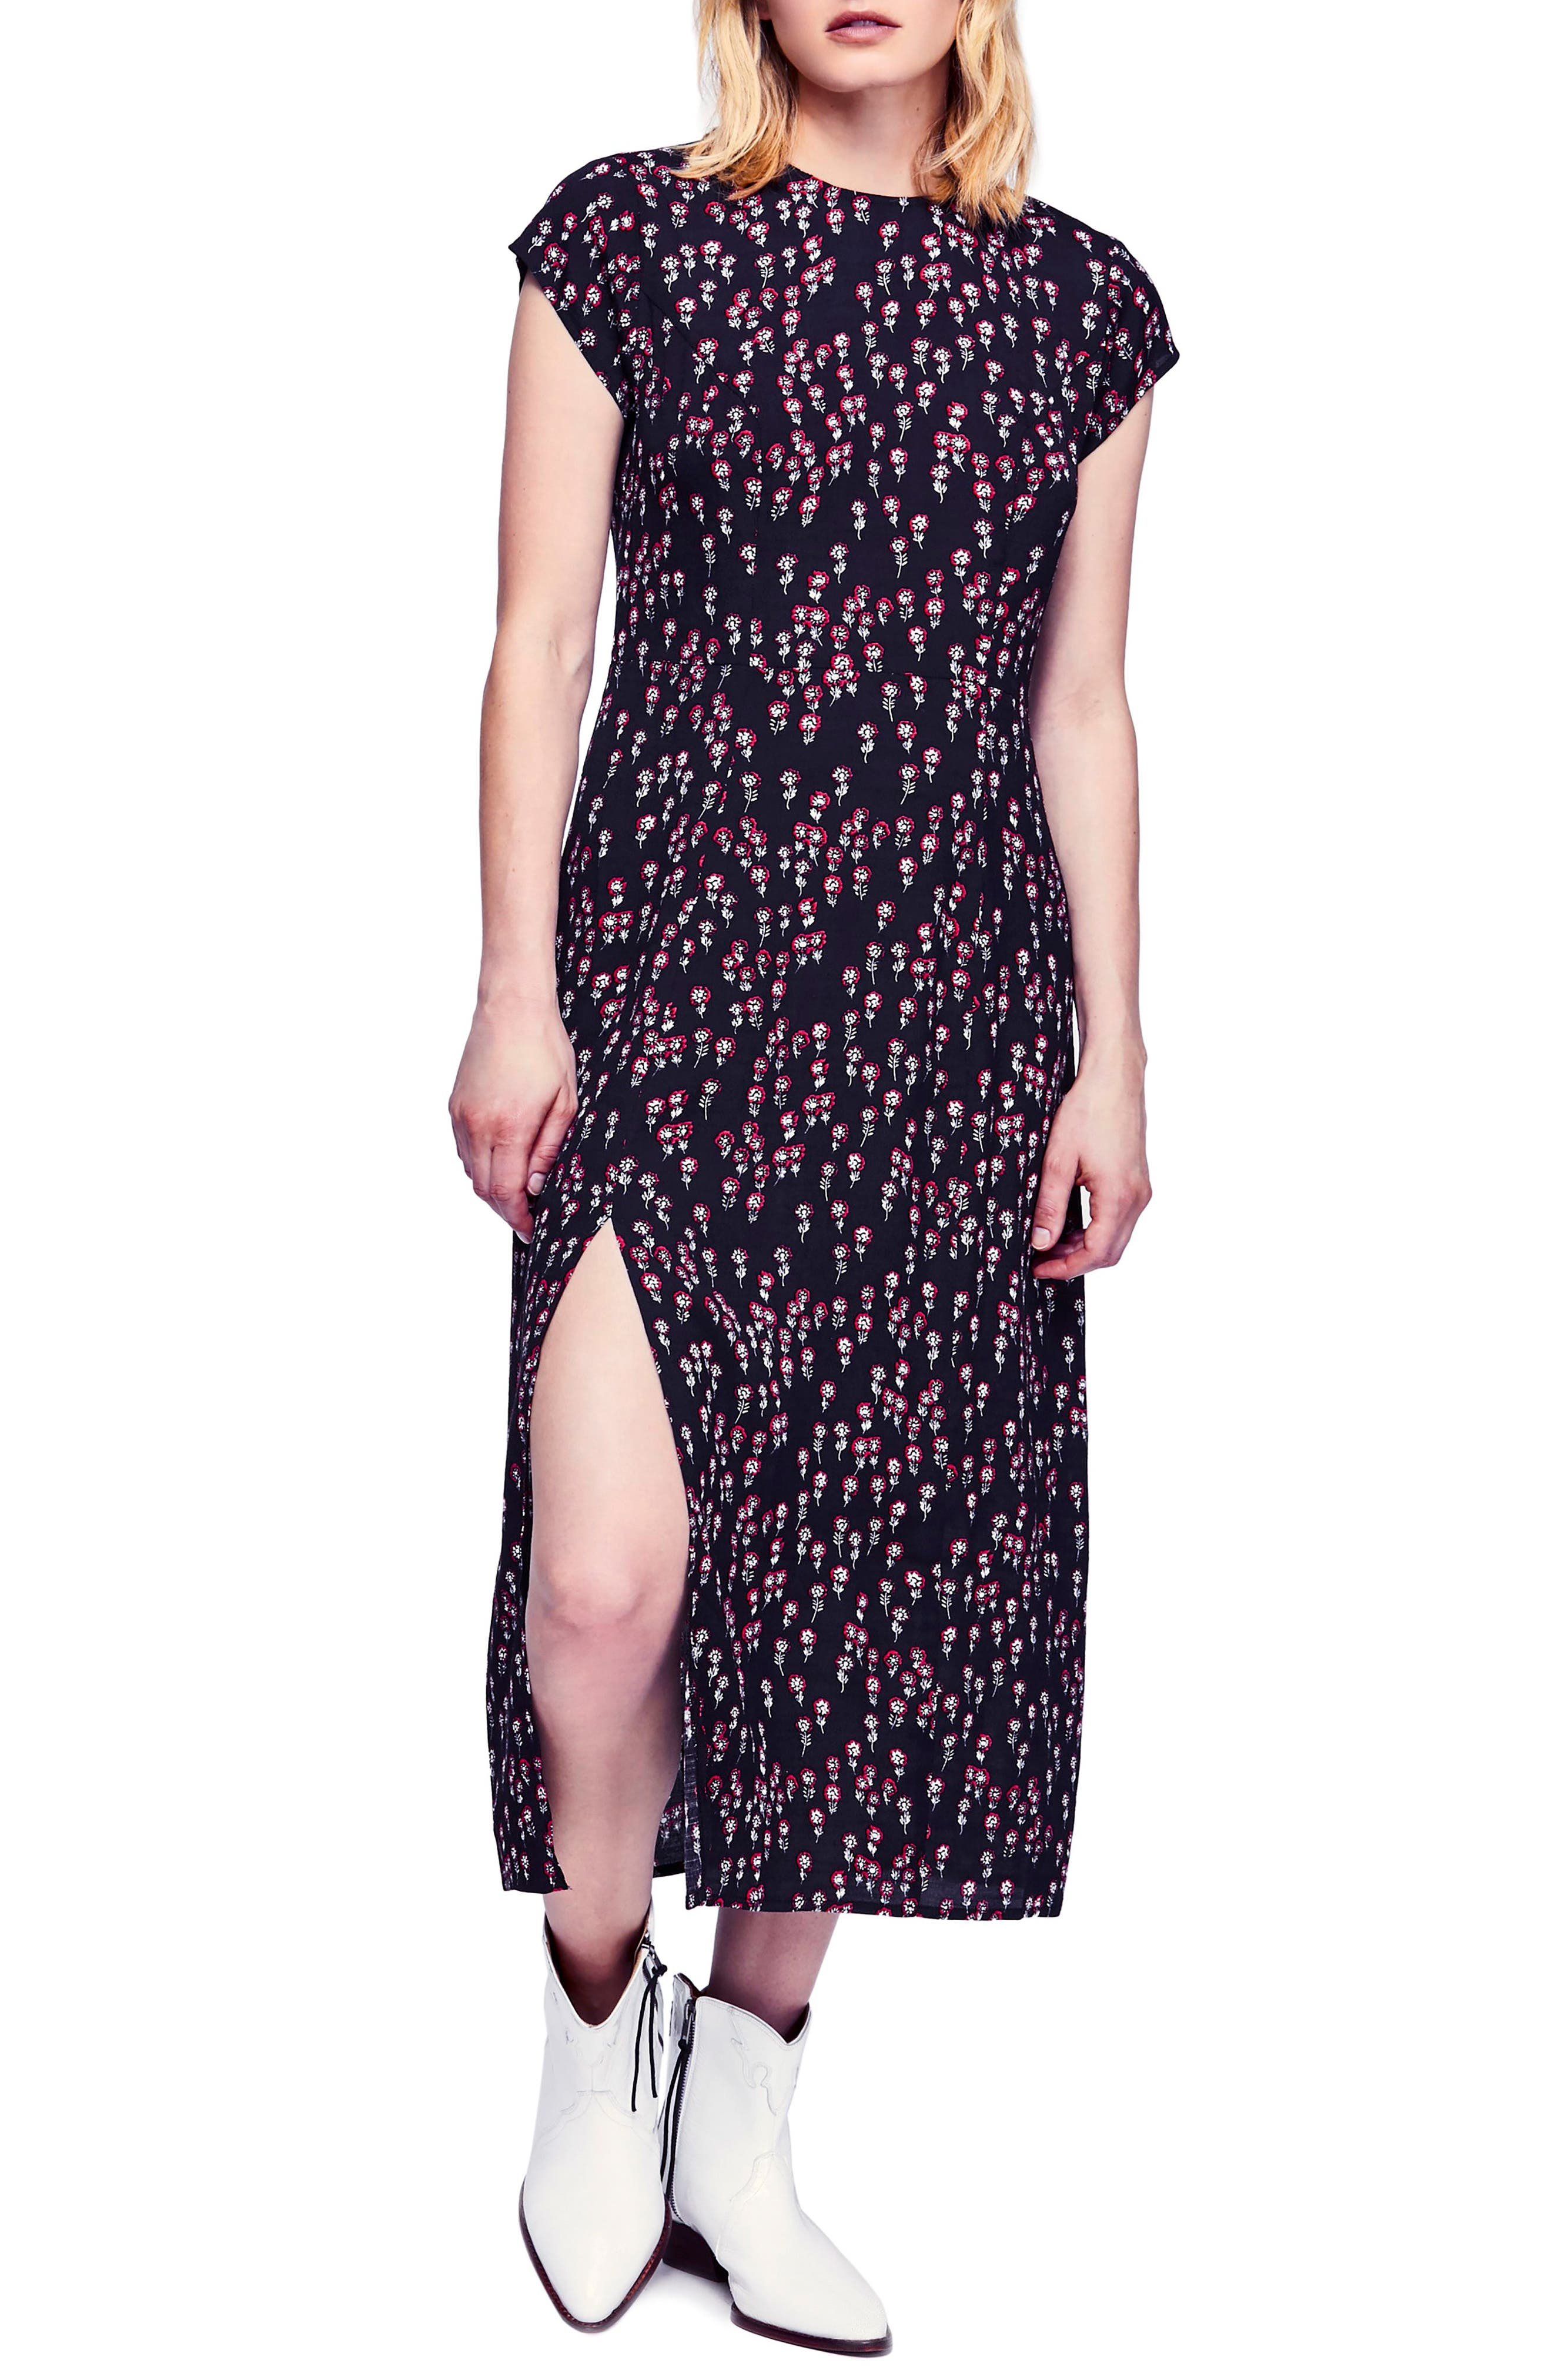 Free People Corrie Midi Dress, Black